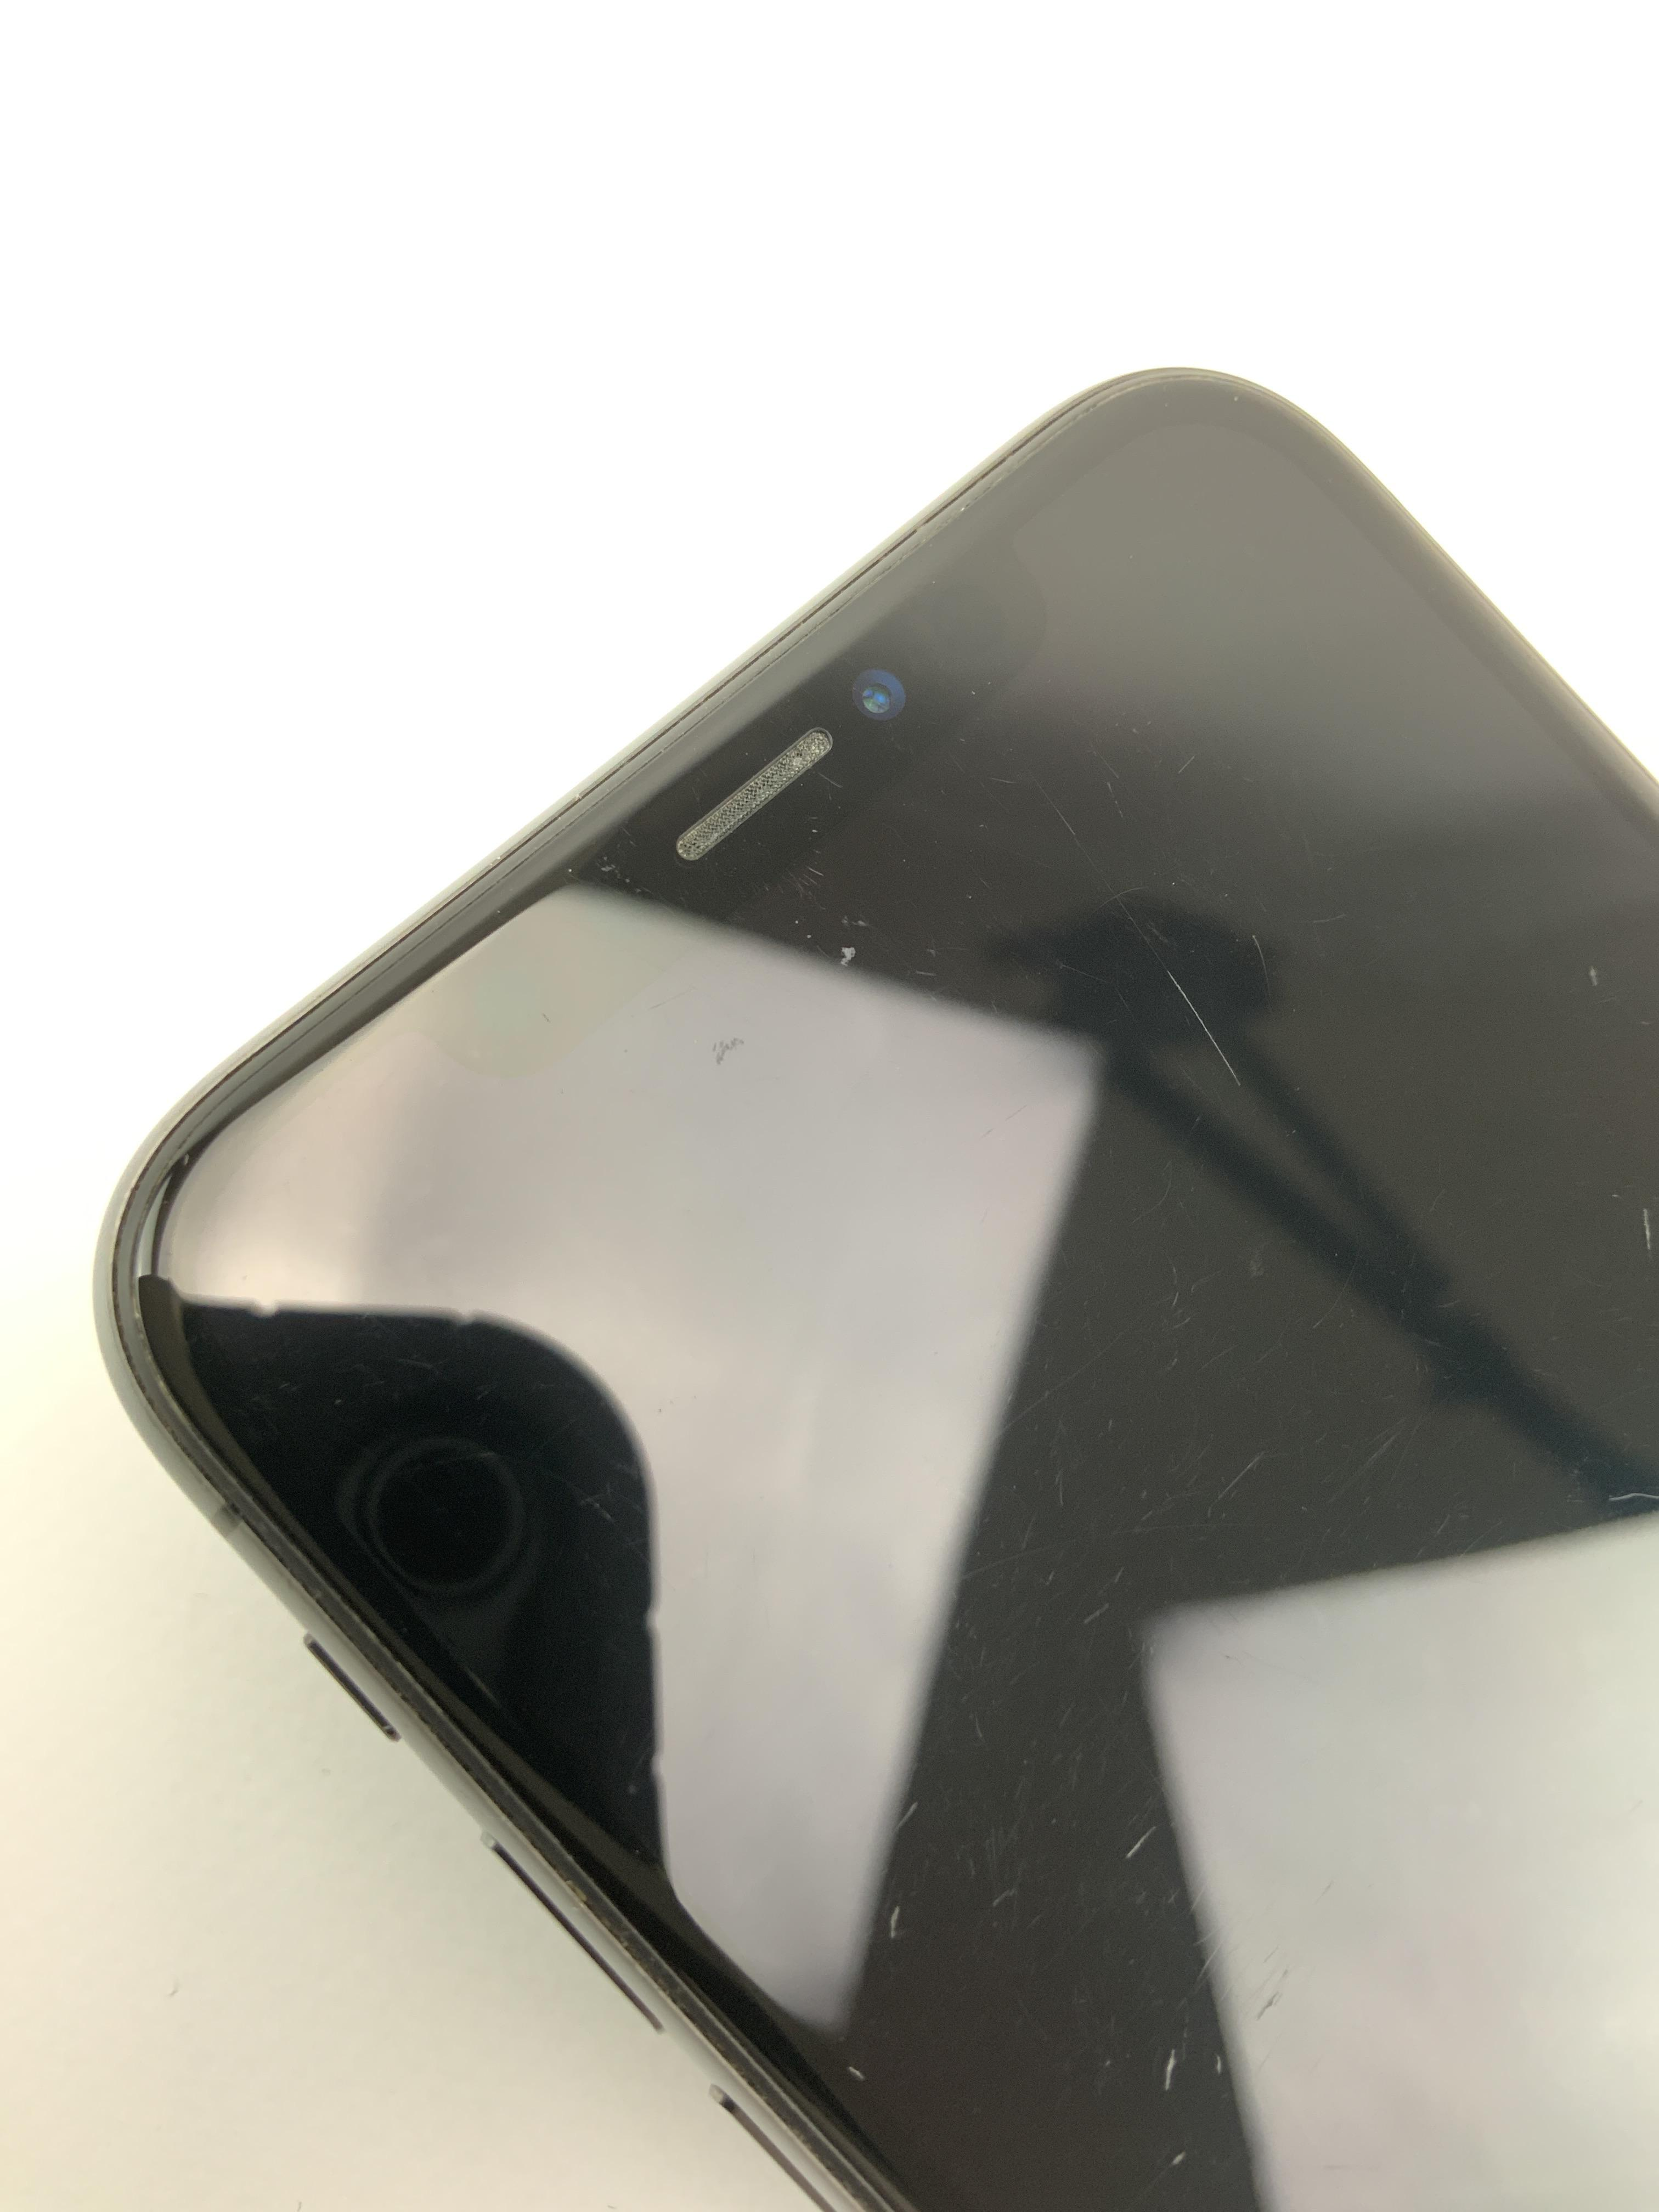 iPhone X 256GB, 256GB, Space Gray, imagen 4